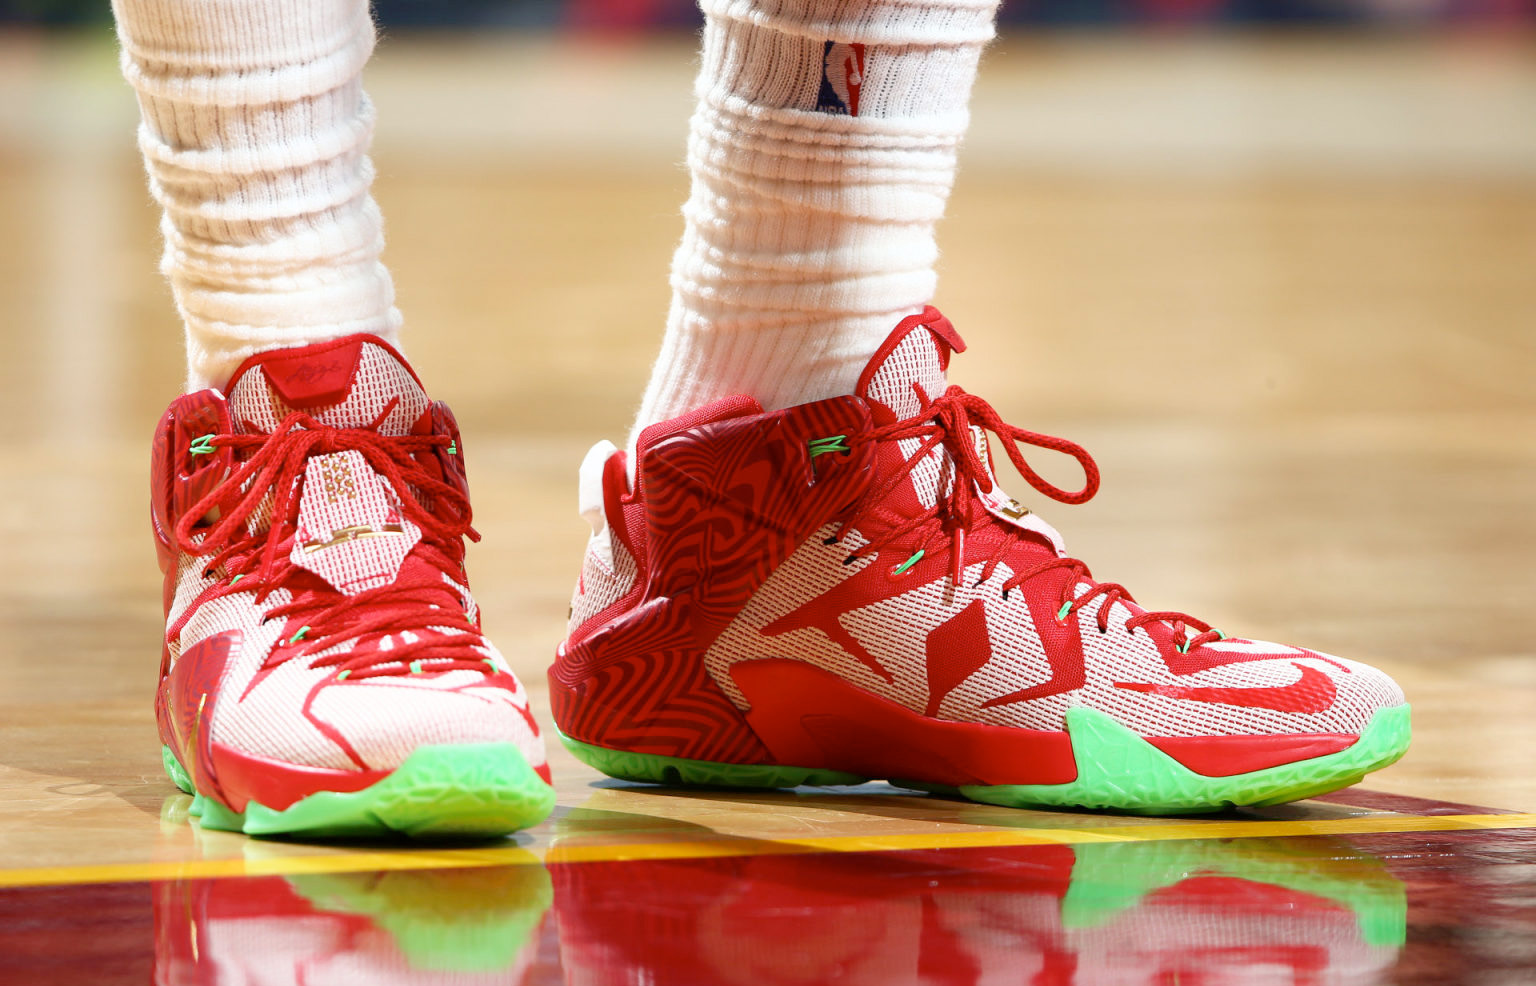 LeBron James Debuts His New \u0026#39;Sprite\u0026#39; Sneakers